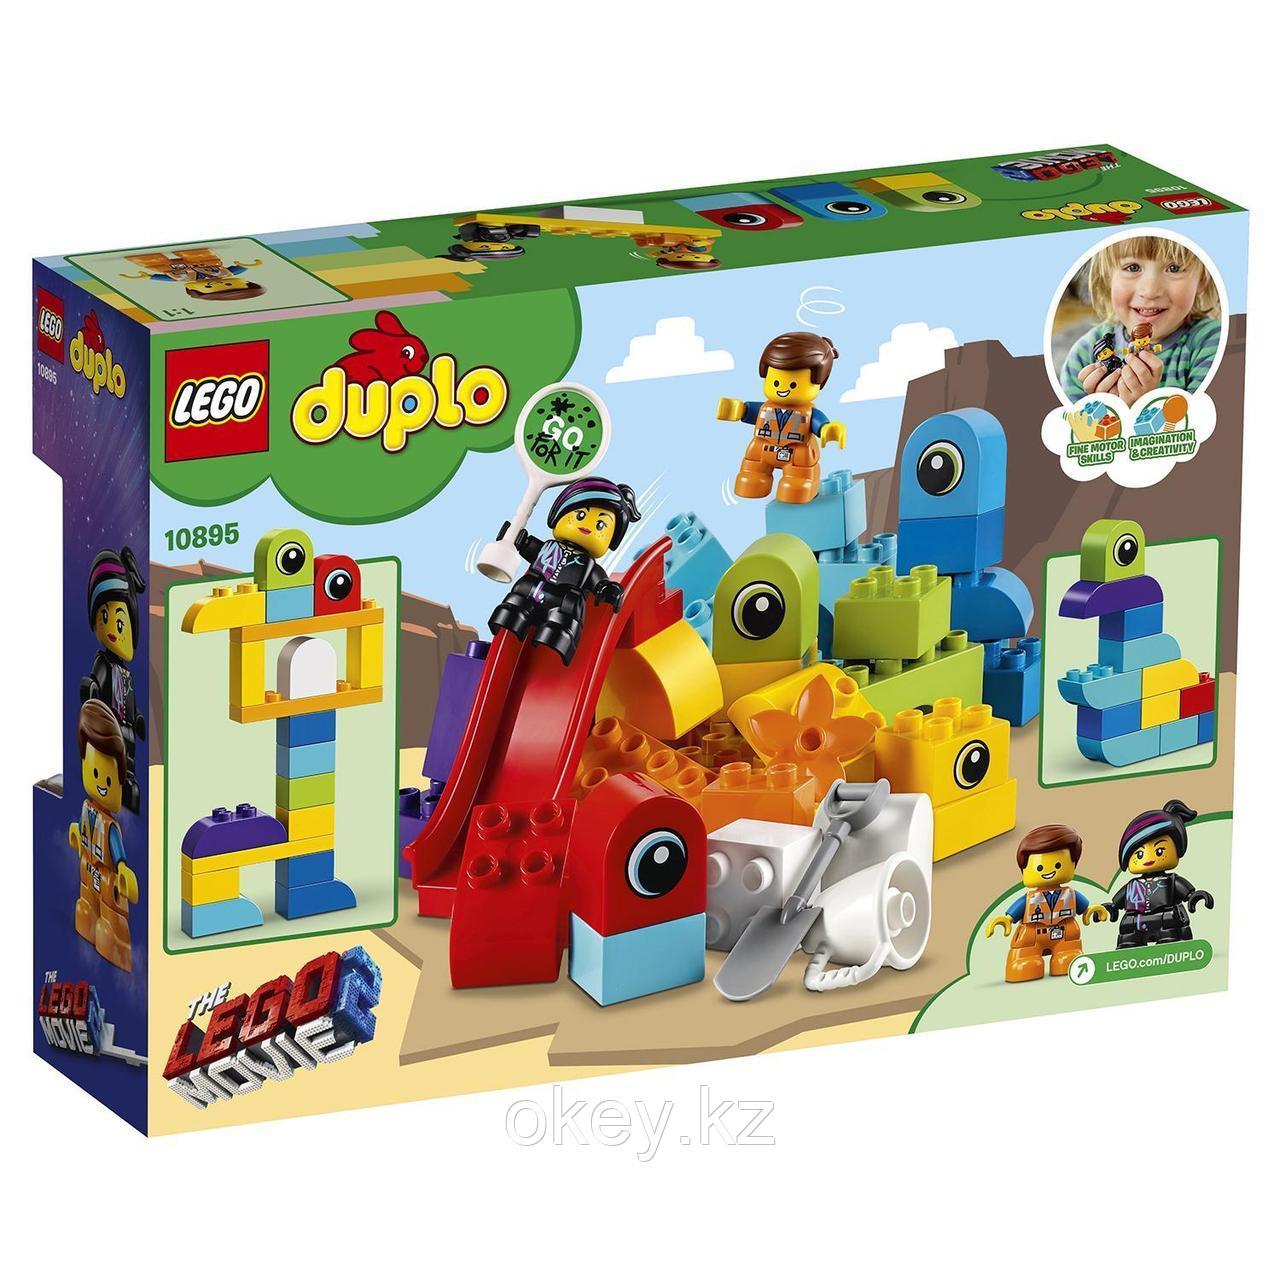 LEGO Duplo: Пришельцы с планеты DUPLO 10895